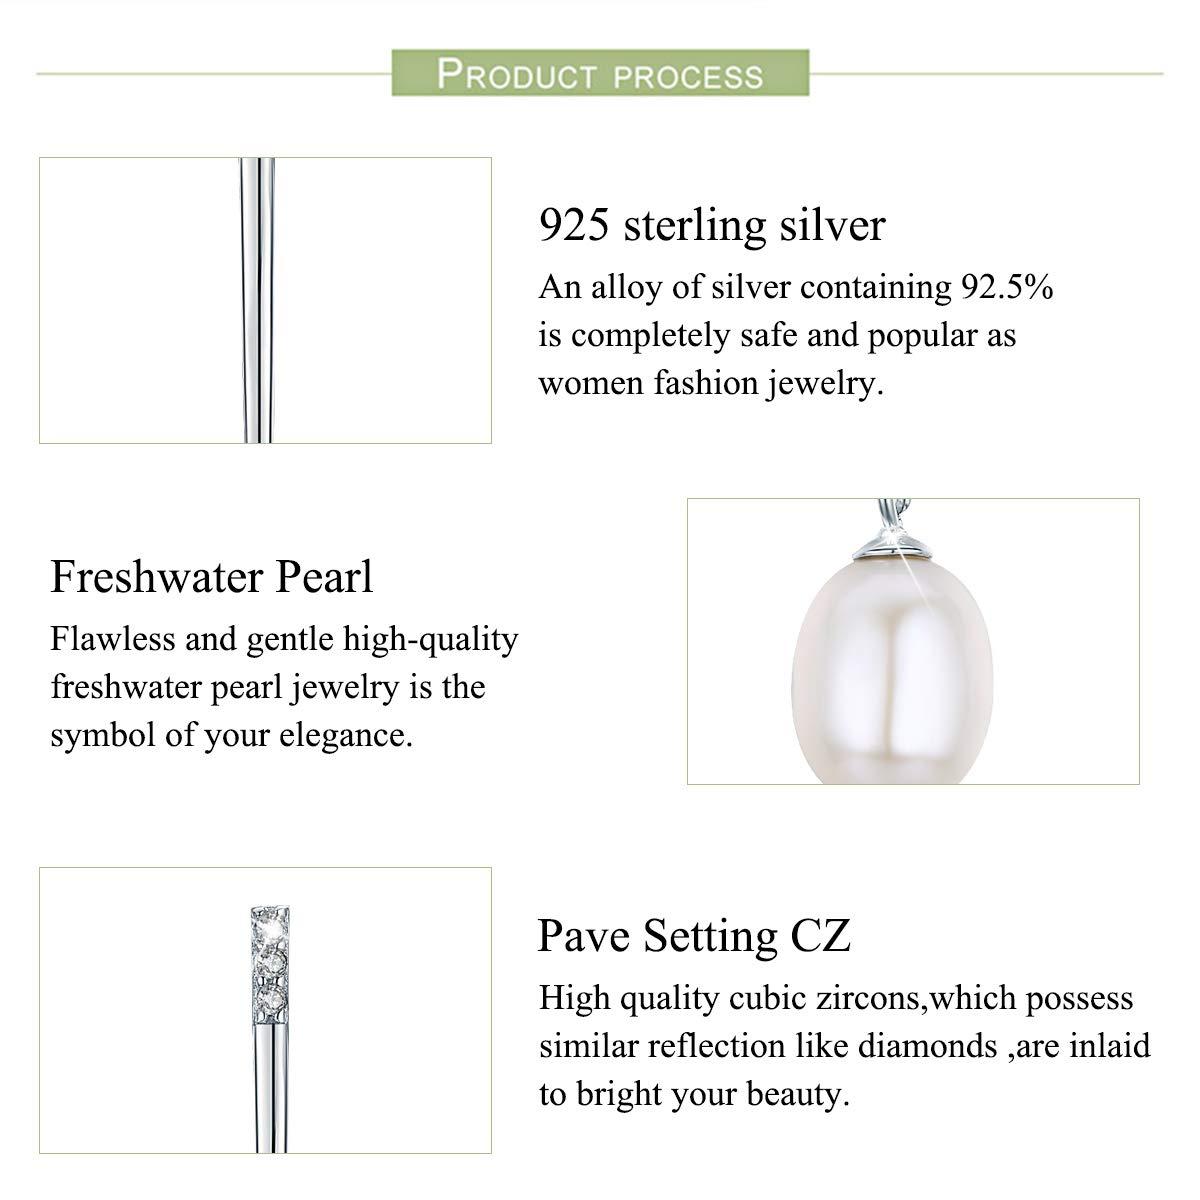 PEARLOVE Pearl Drop Stud/Earrings 925 Sterling Silver Long Dangle Earring Freshwater Pearls Gift for Her PEW00030